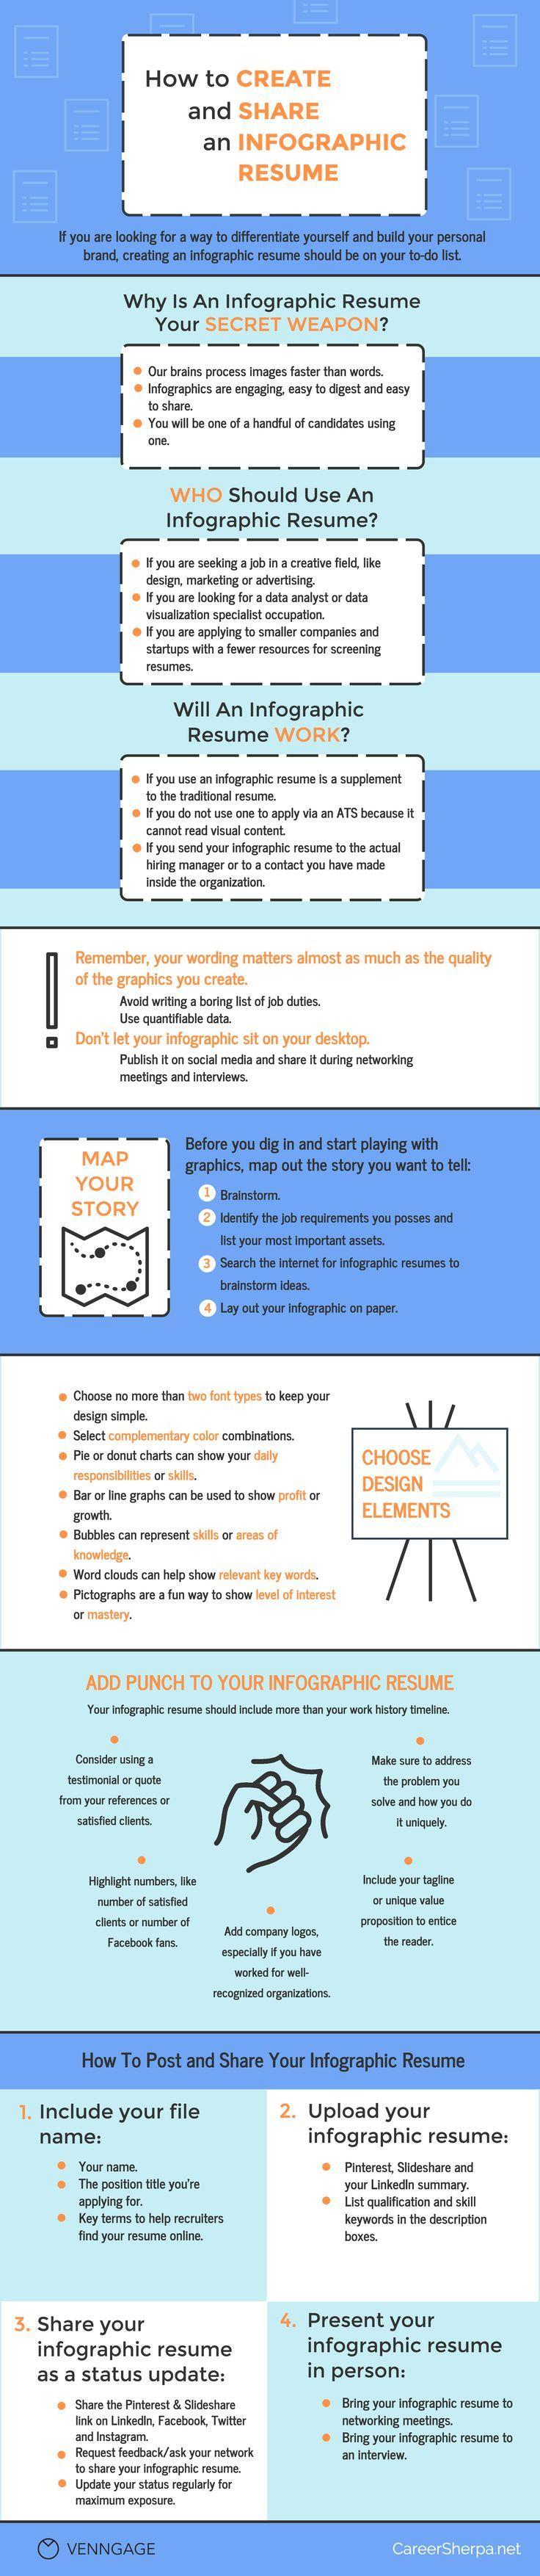 Mejores 257 imágenes de Finding a Job   Resume Tips en Pinterest ...